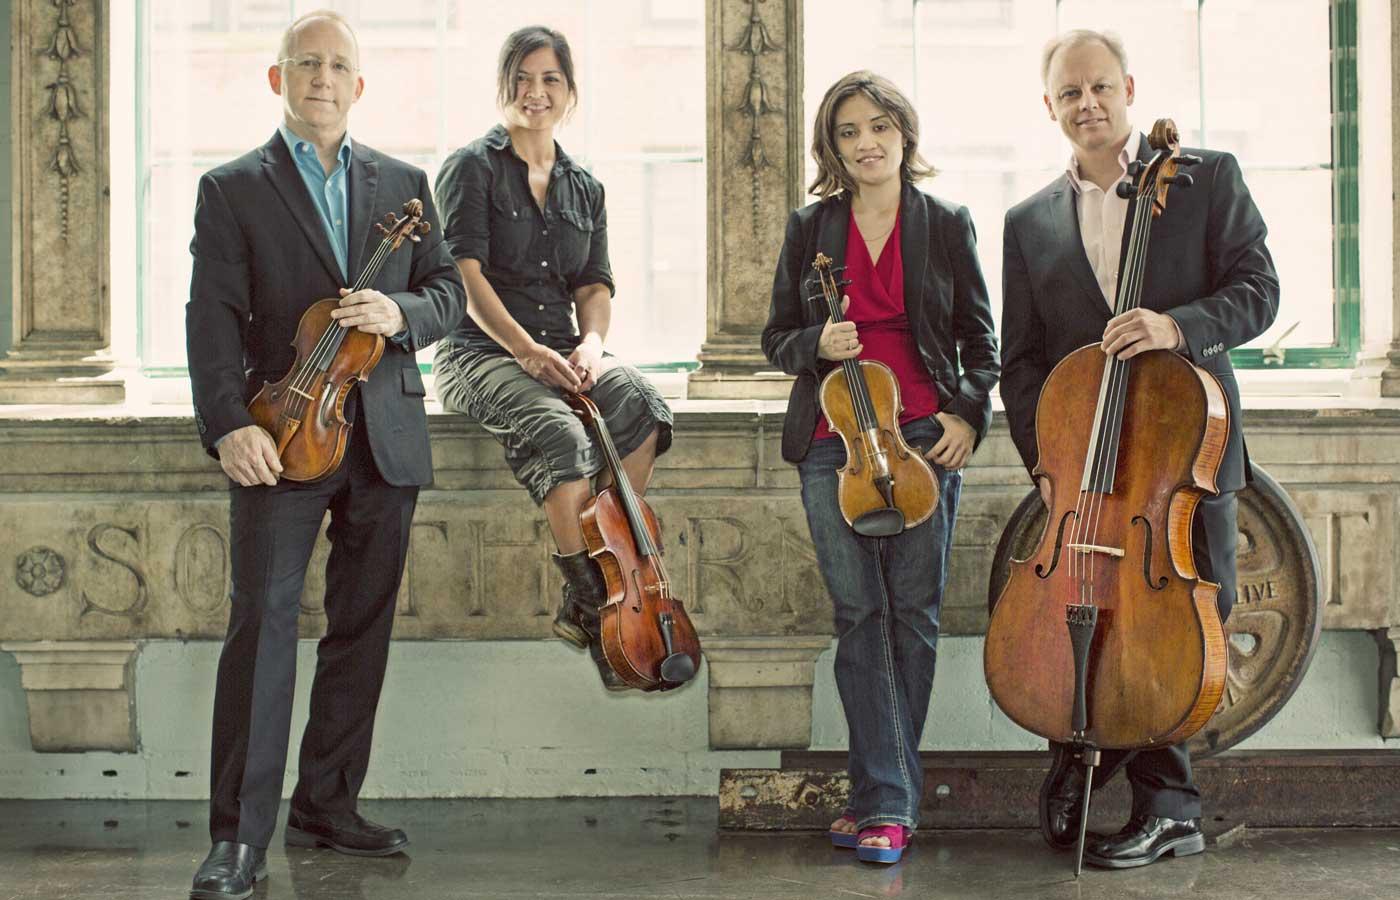 UMSL's Arianna String Quartet